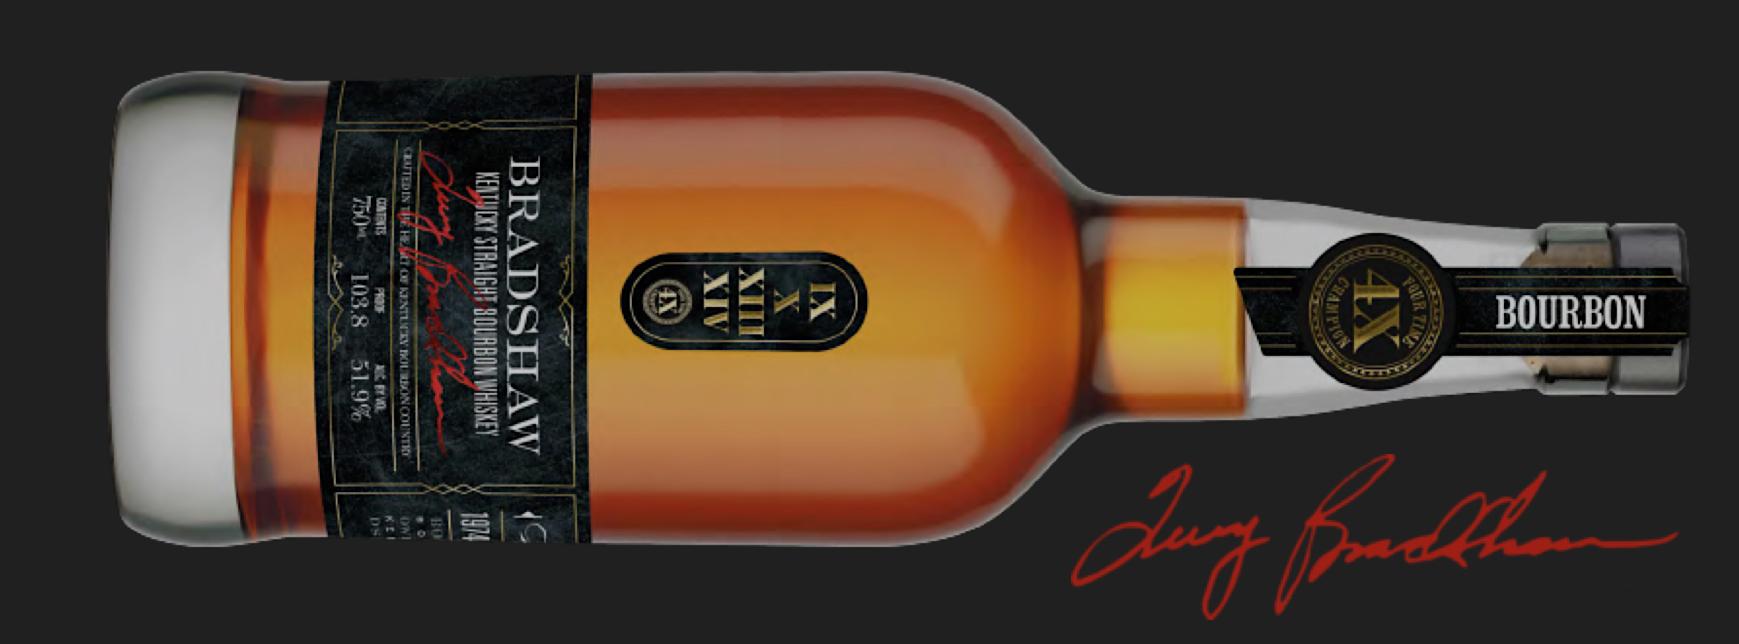 Bradshaw Bourbon